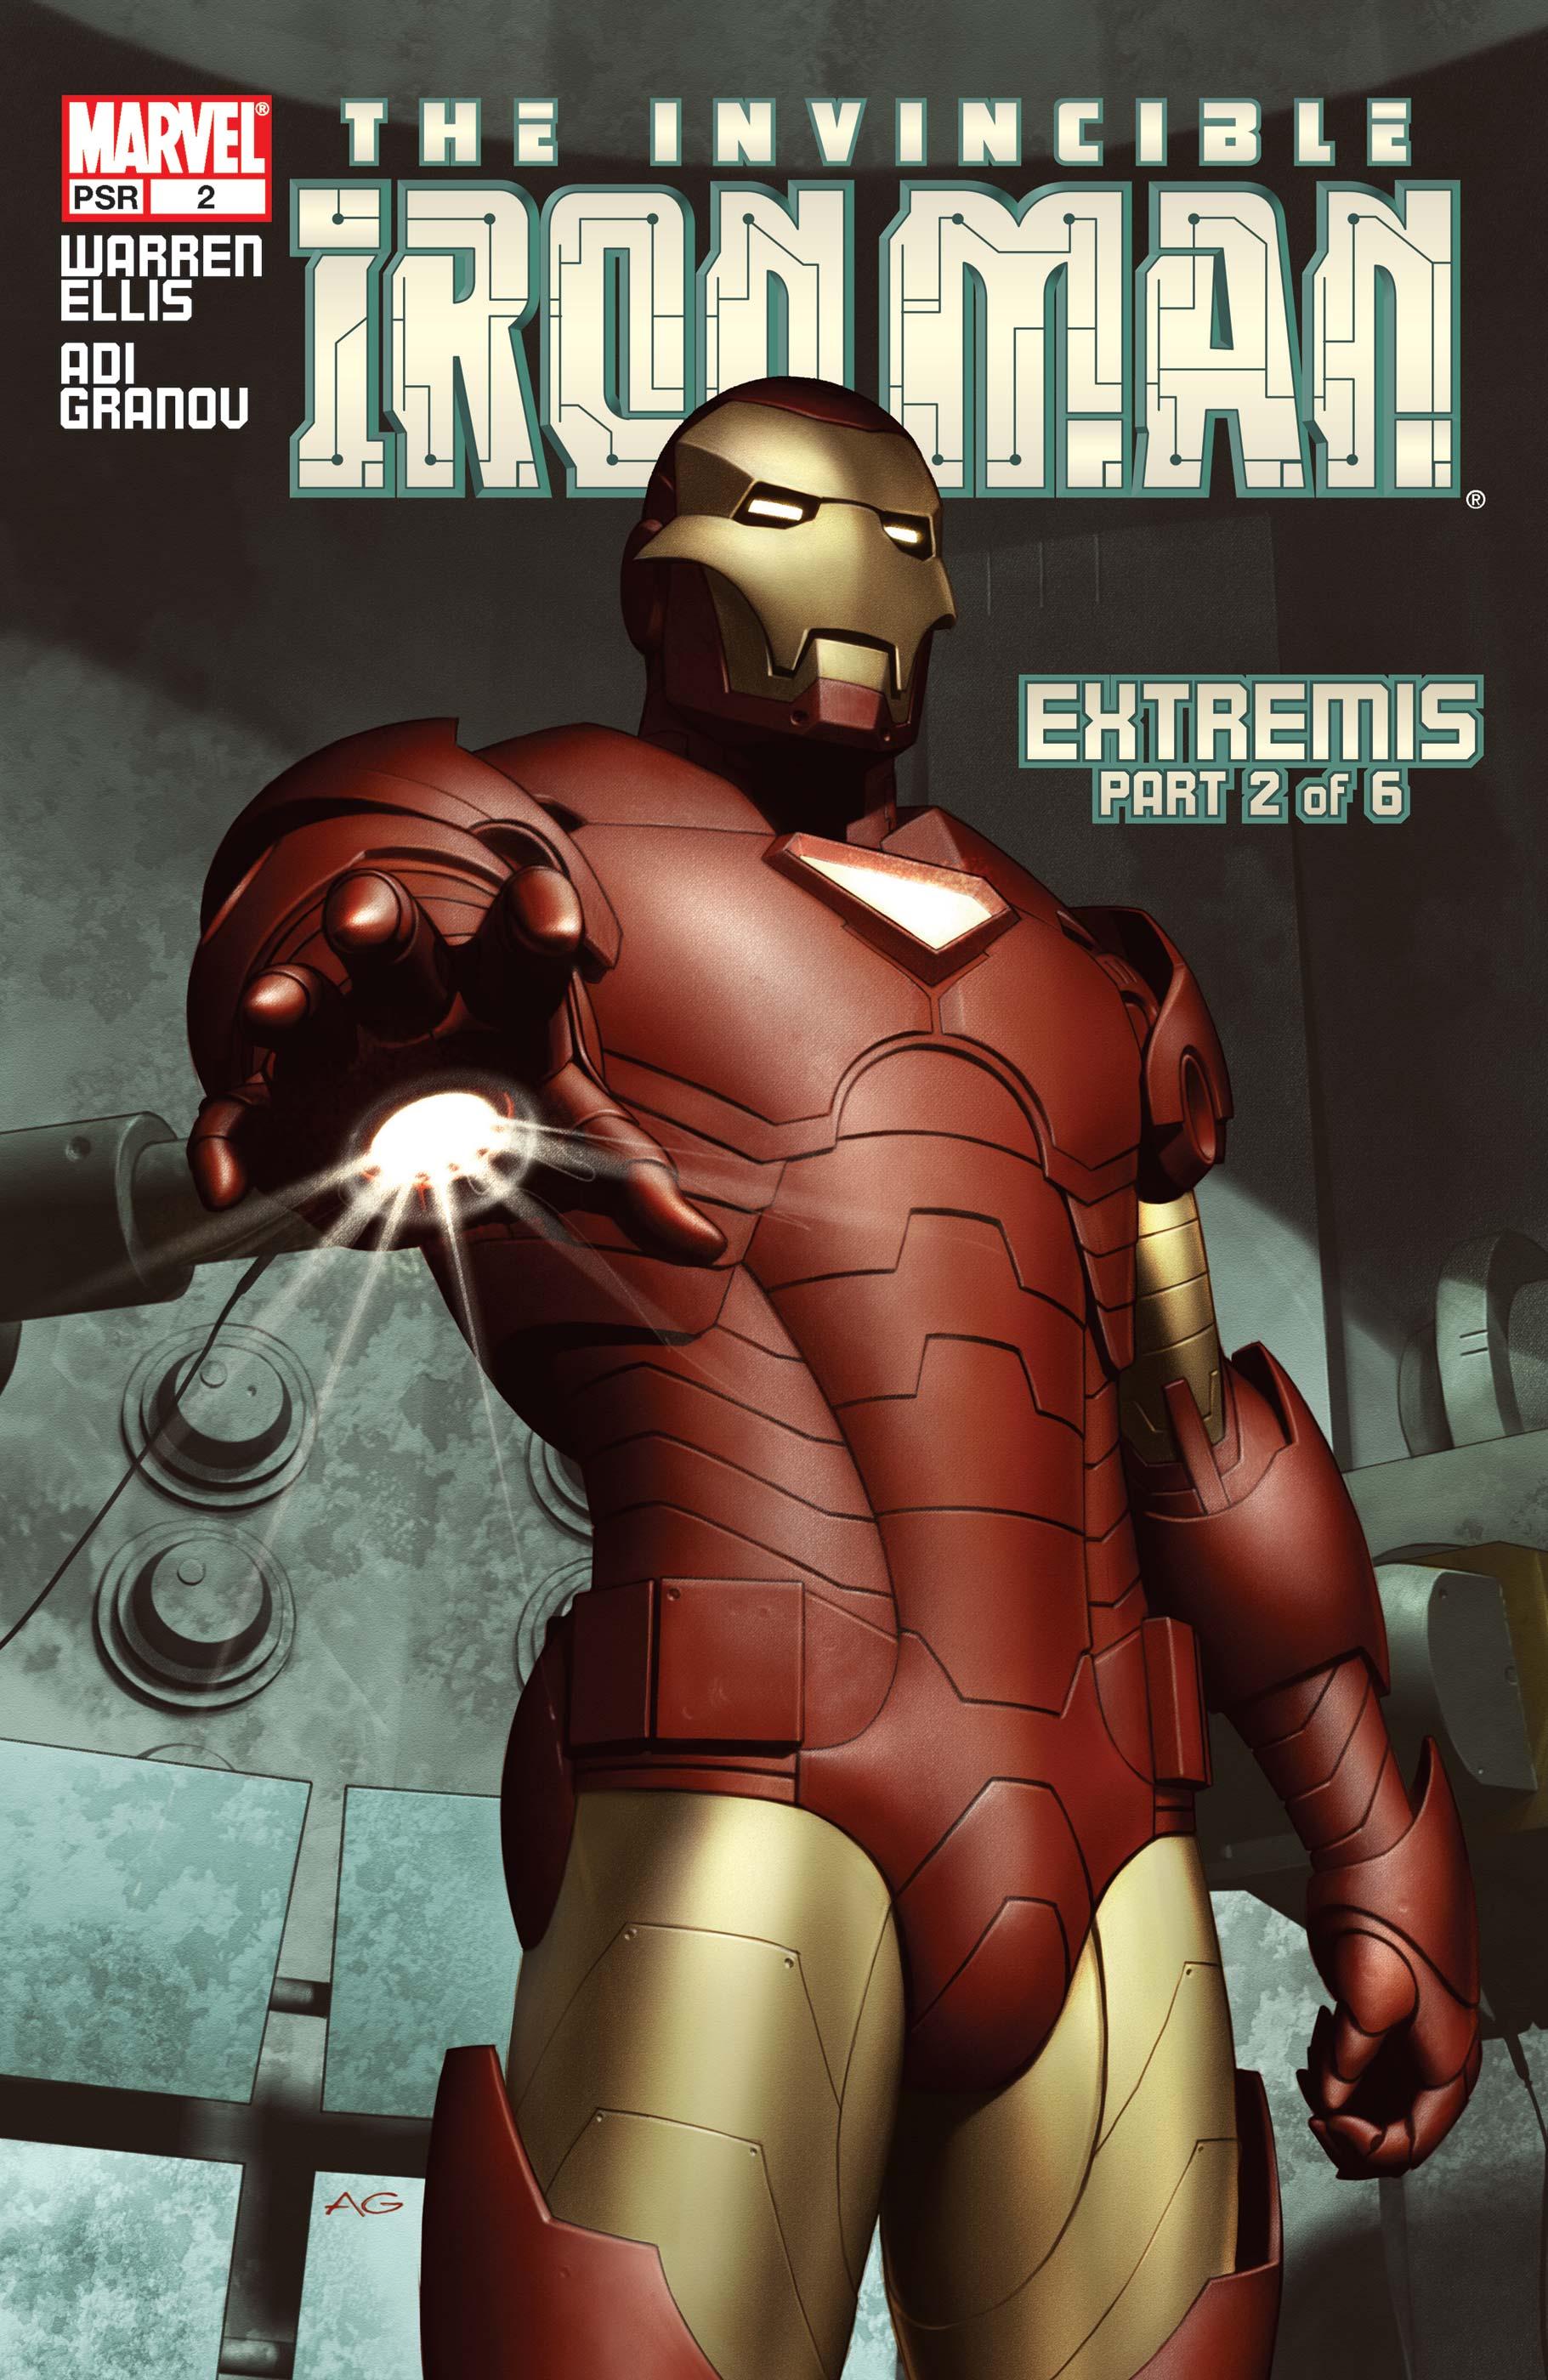 The Invincible Iron Man (2004) #2